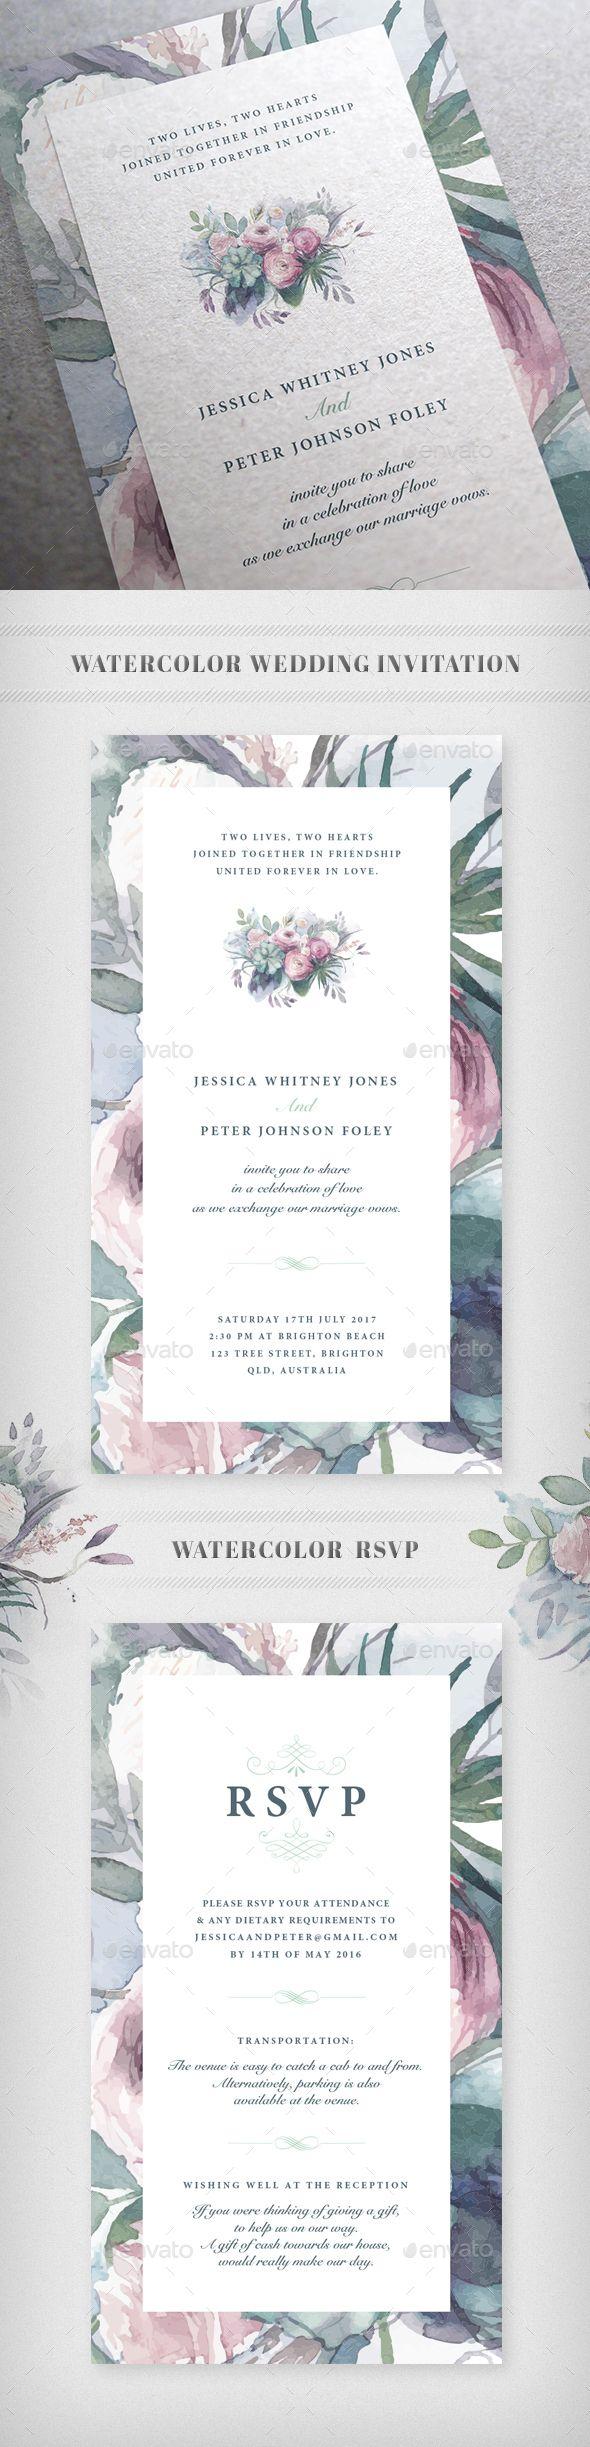 Watercolor Wedding Invitation Card Template Vector EPS #design Download: http://graphicriver.net/item/watercolor-wedding-invitation/13868151?ref=ksioks